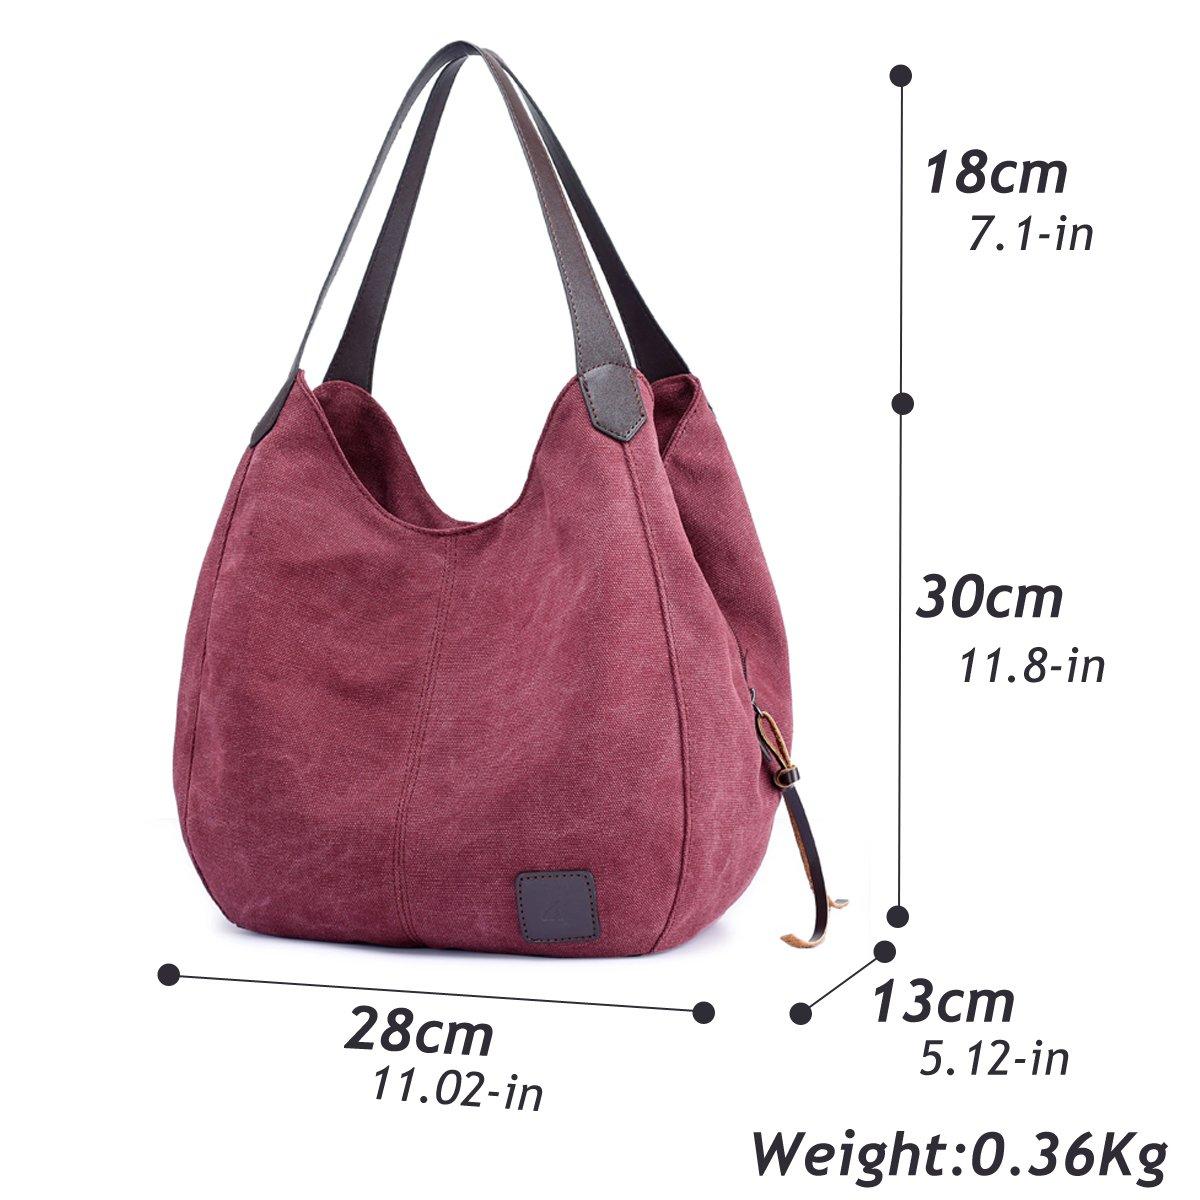 a572aa48d118b Crossbody Bags Hiigoo Fashion Womens Multi-pocket Cotton Canvas Handbags  Shoulder Bags Totes Purses FBB0179-06